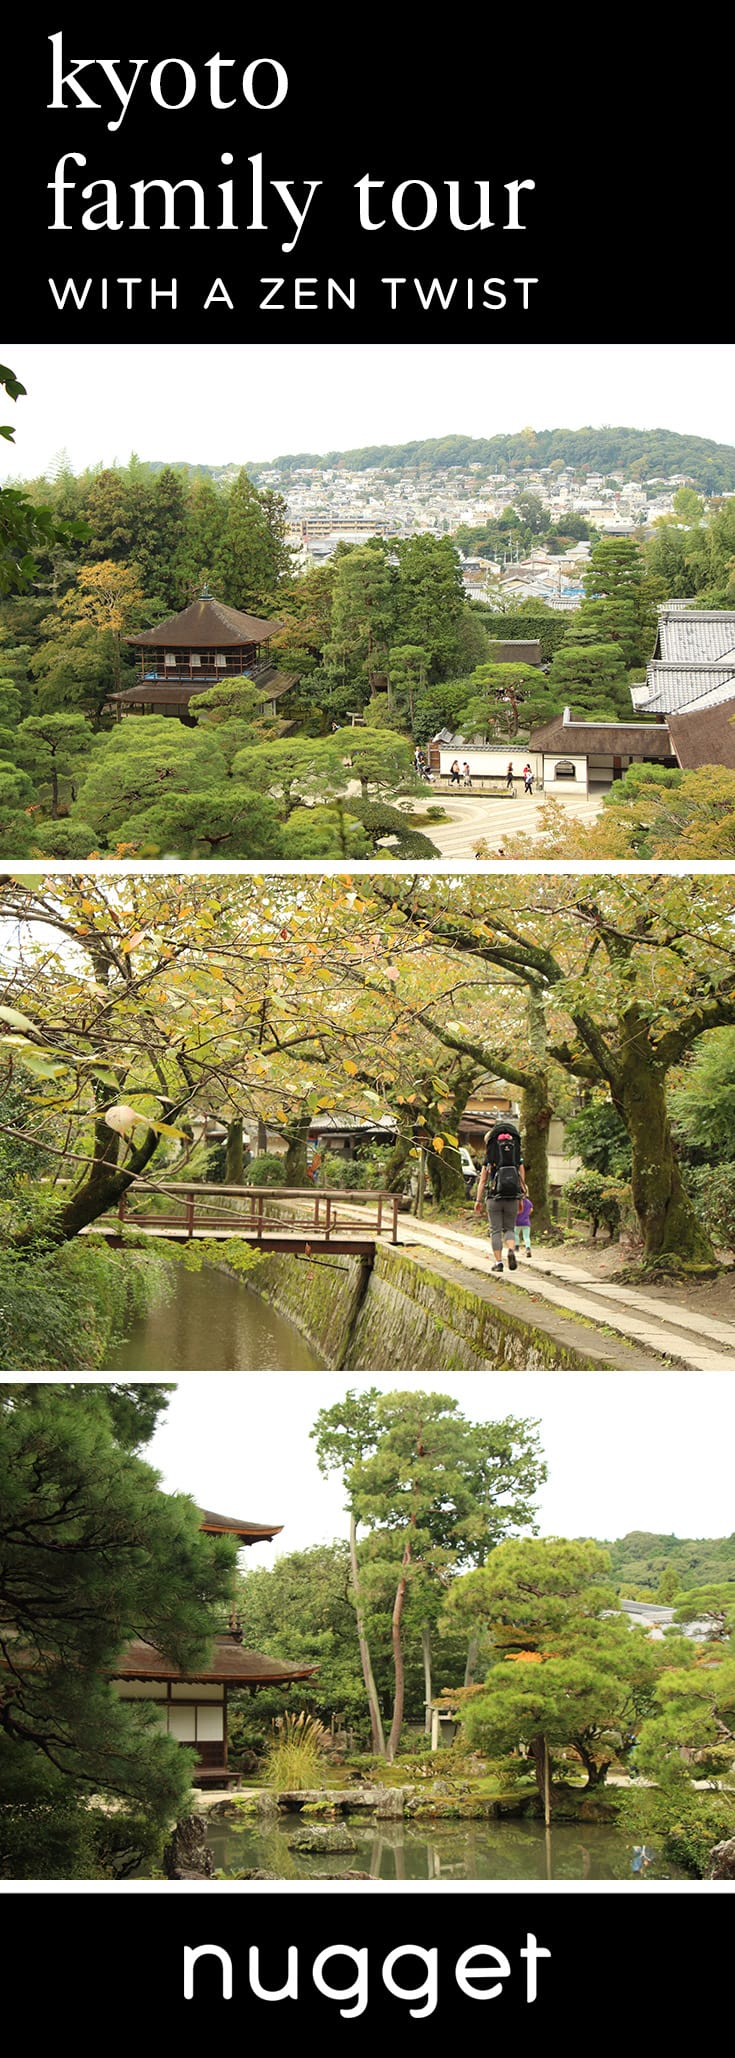 A Kyoto Tour With a Zen Twist